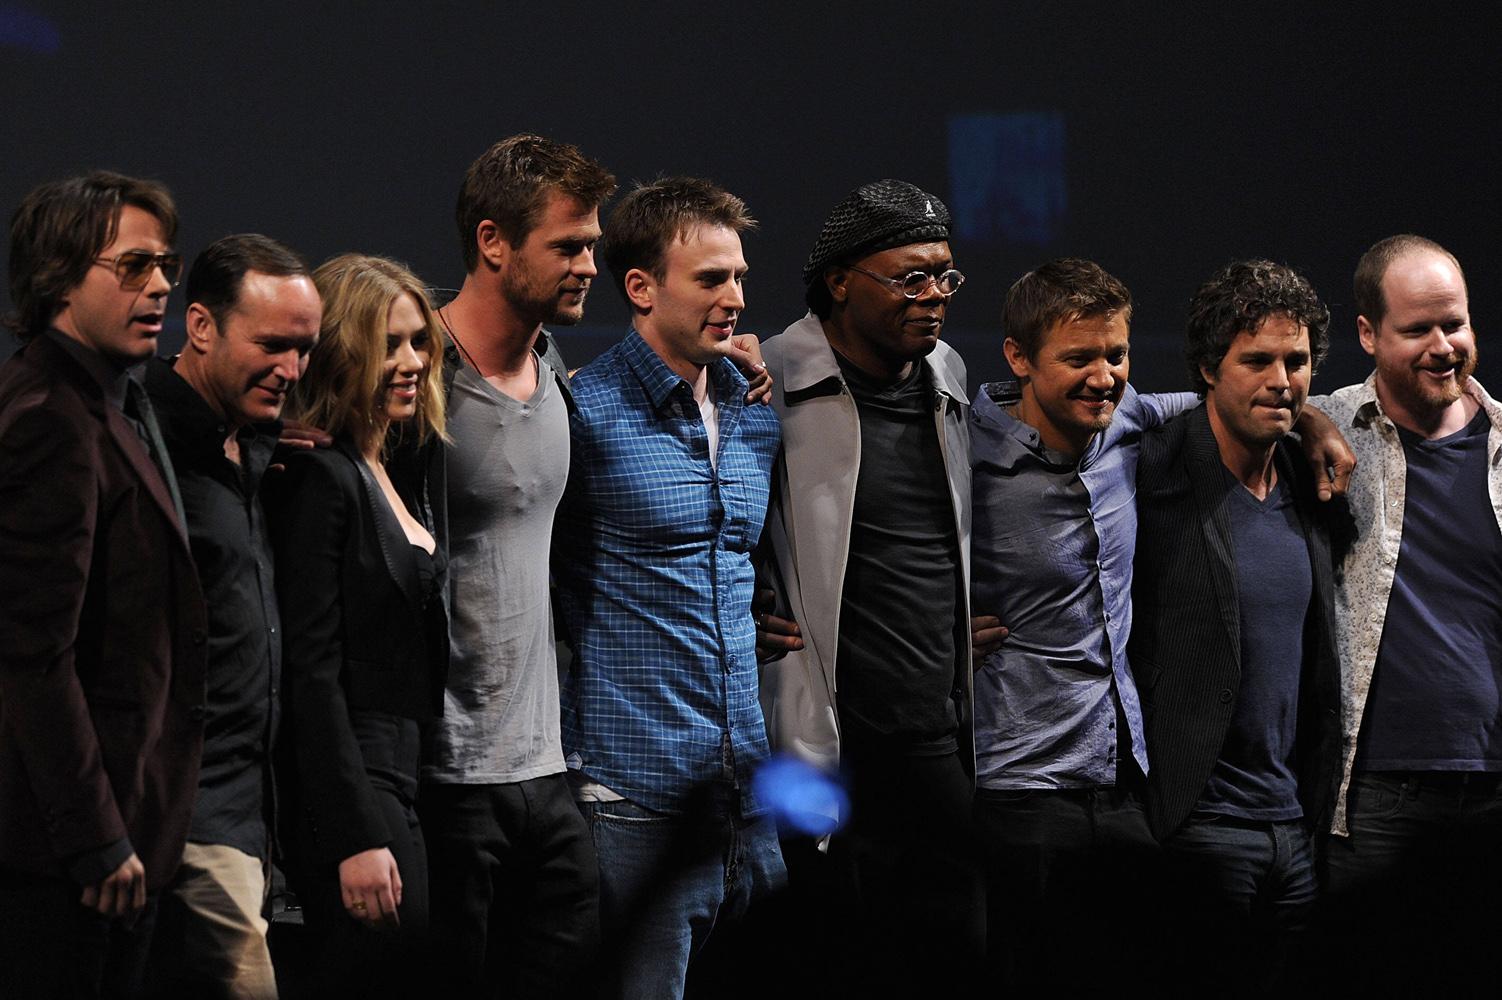 http://4.bp.blogspot.com/-XgeAZxNiBfo/Tb_Dyj4g9NI/AAAAAAAADQQ/hQM8WI6BzeE/s1600/AvengersCast_Cinemacon.jpg